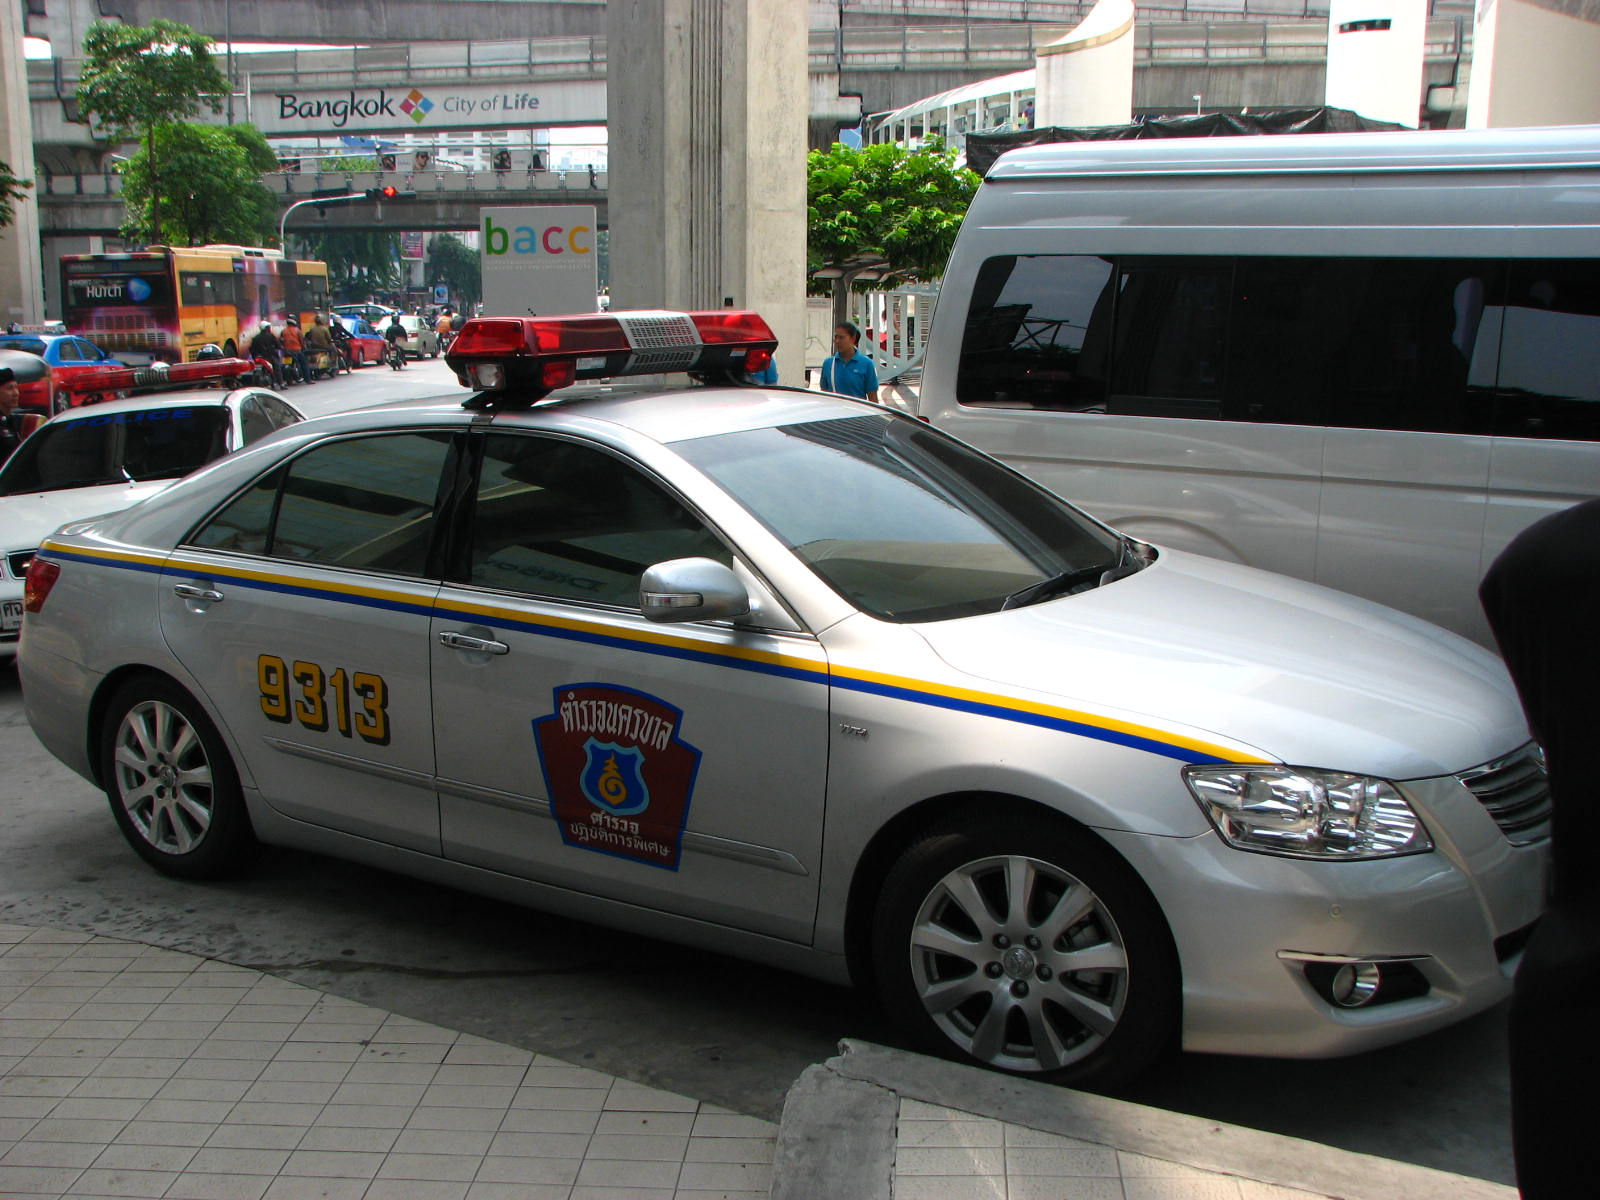 File:Thailand Police Highway Patrol Toyota Camry VVTi - Flickr